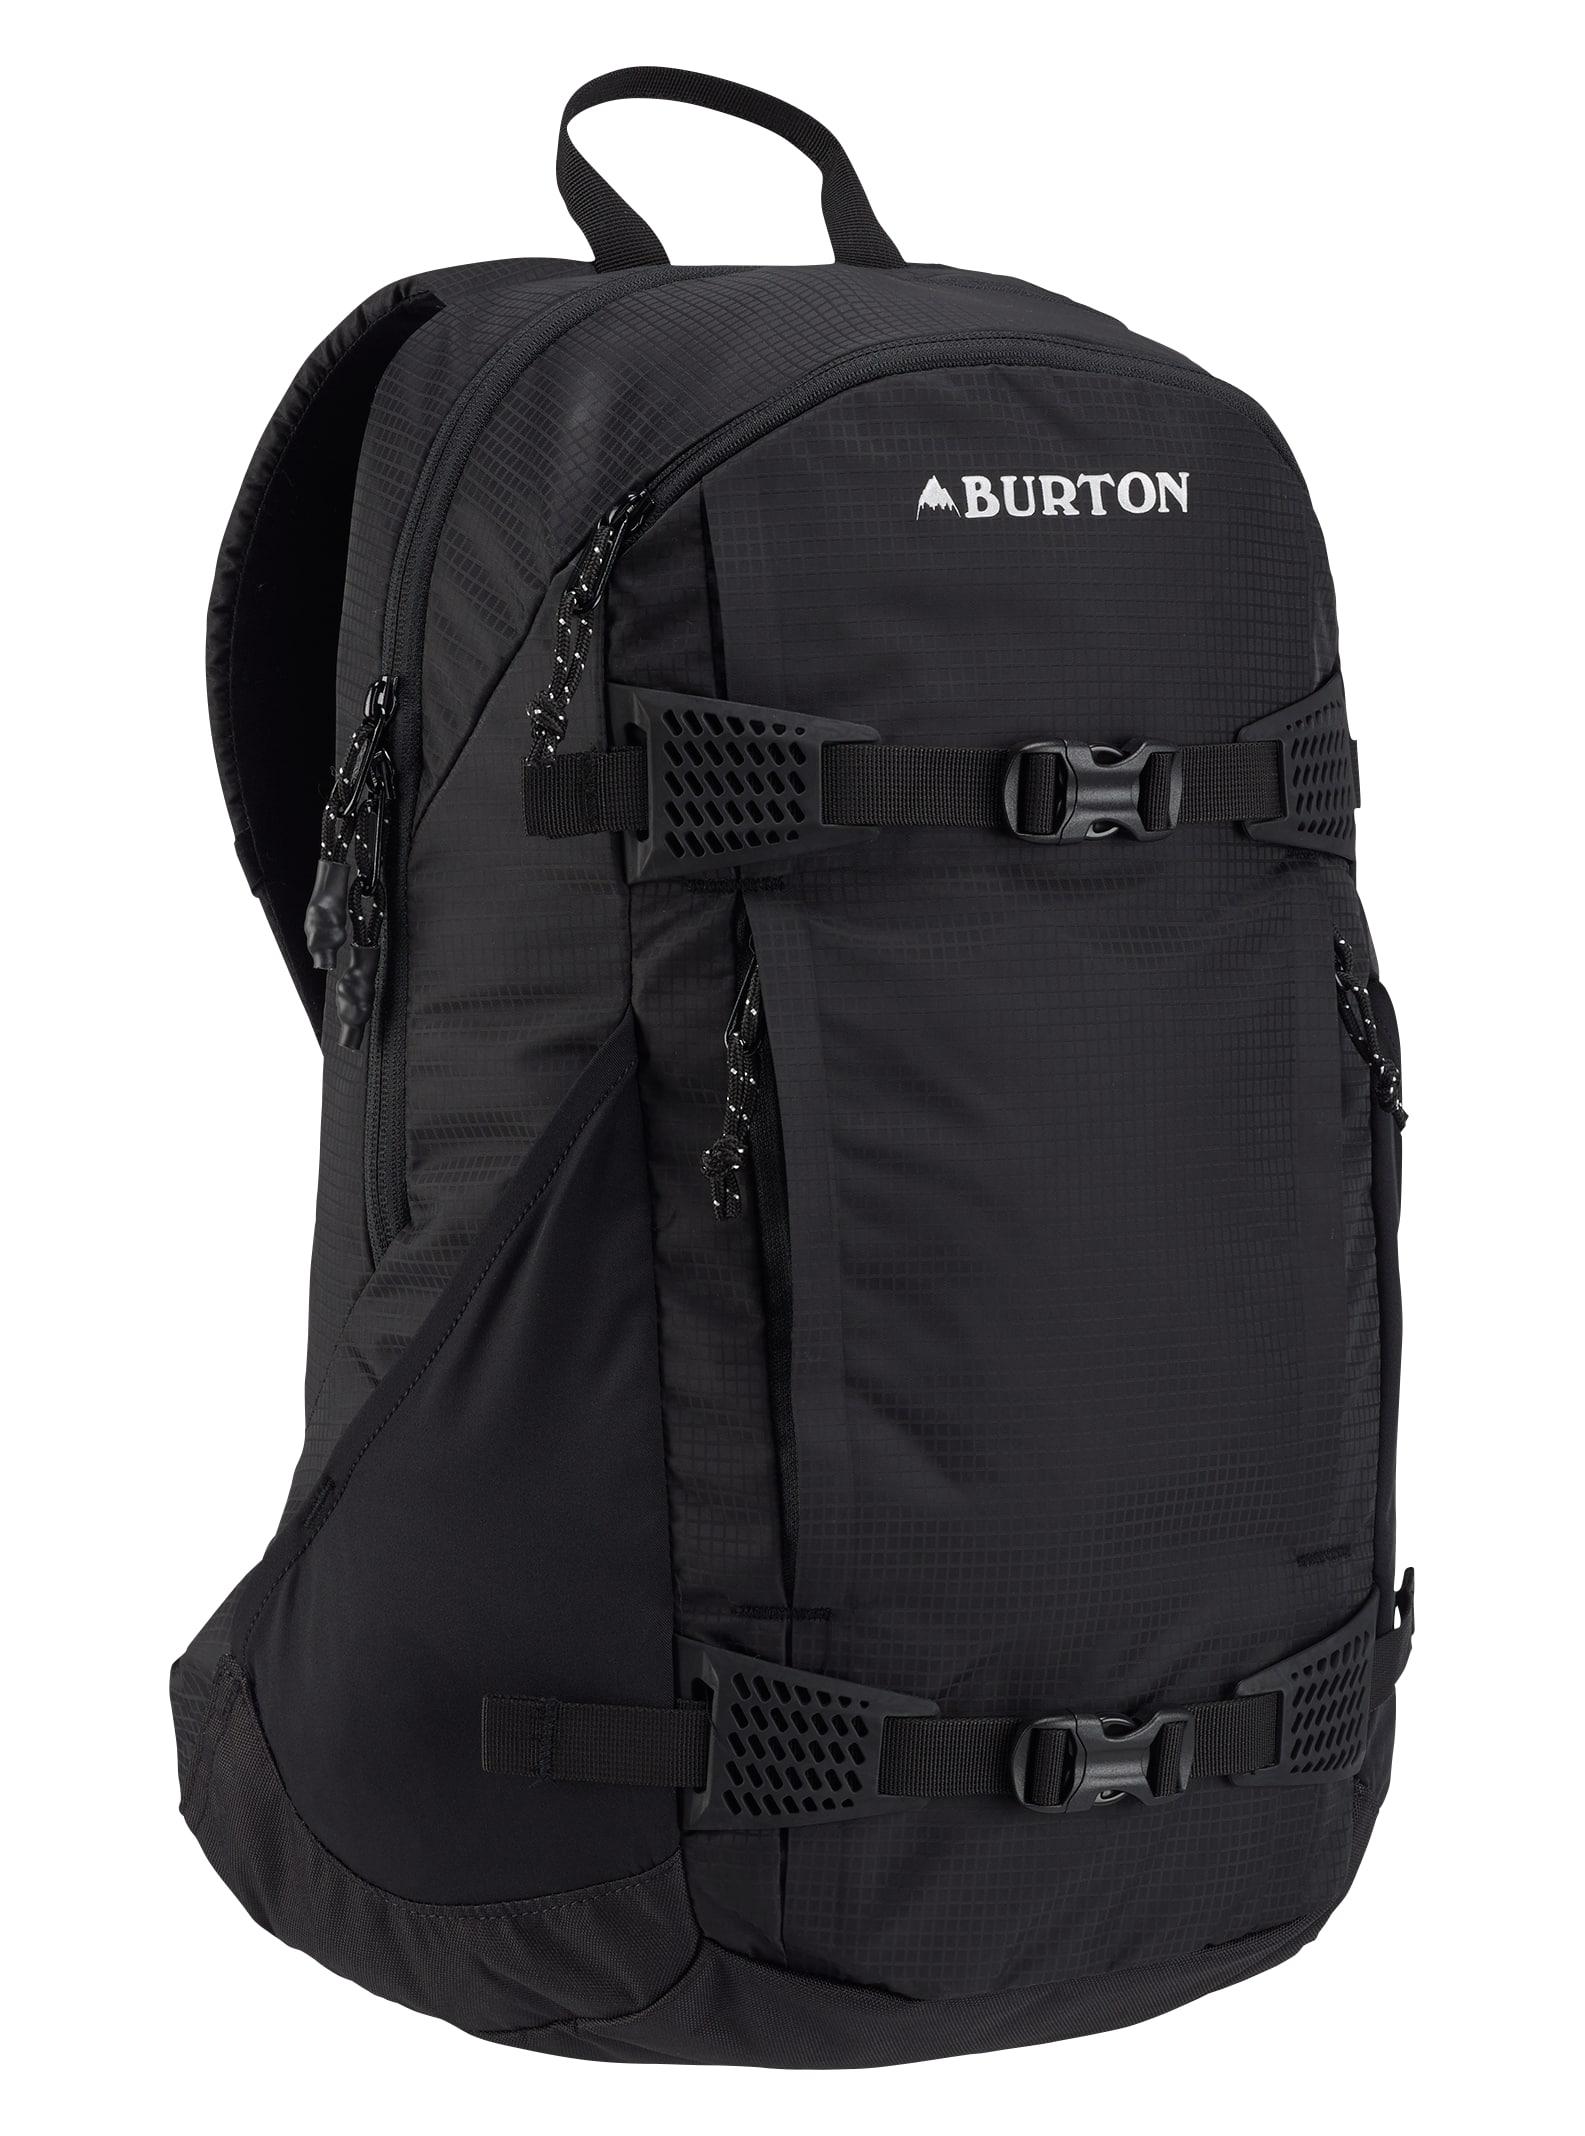 72a2c3a0f1eca Burton Day Hiker 25L Backpack | Burton.com Fall 2019